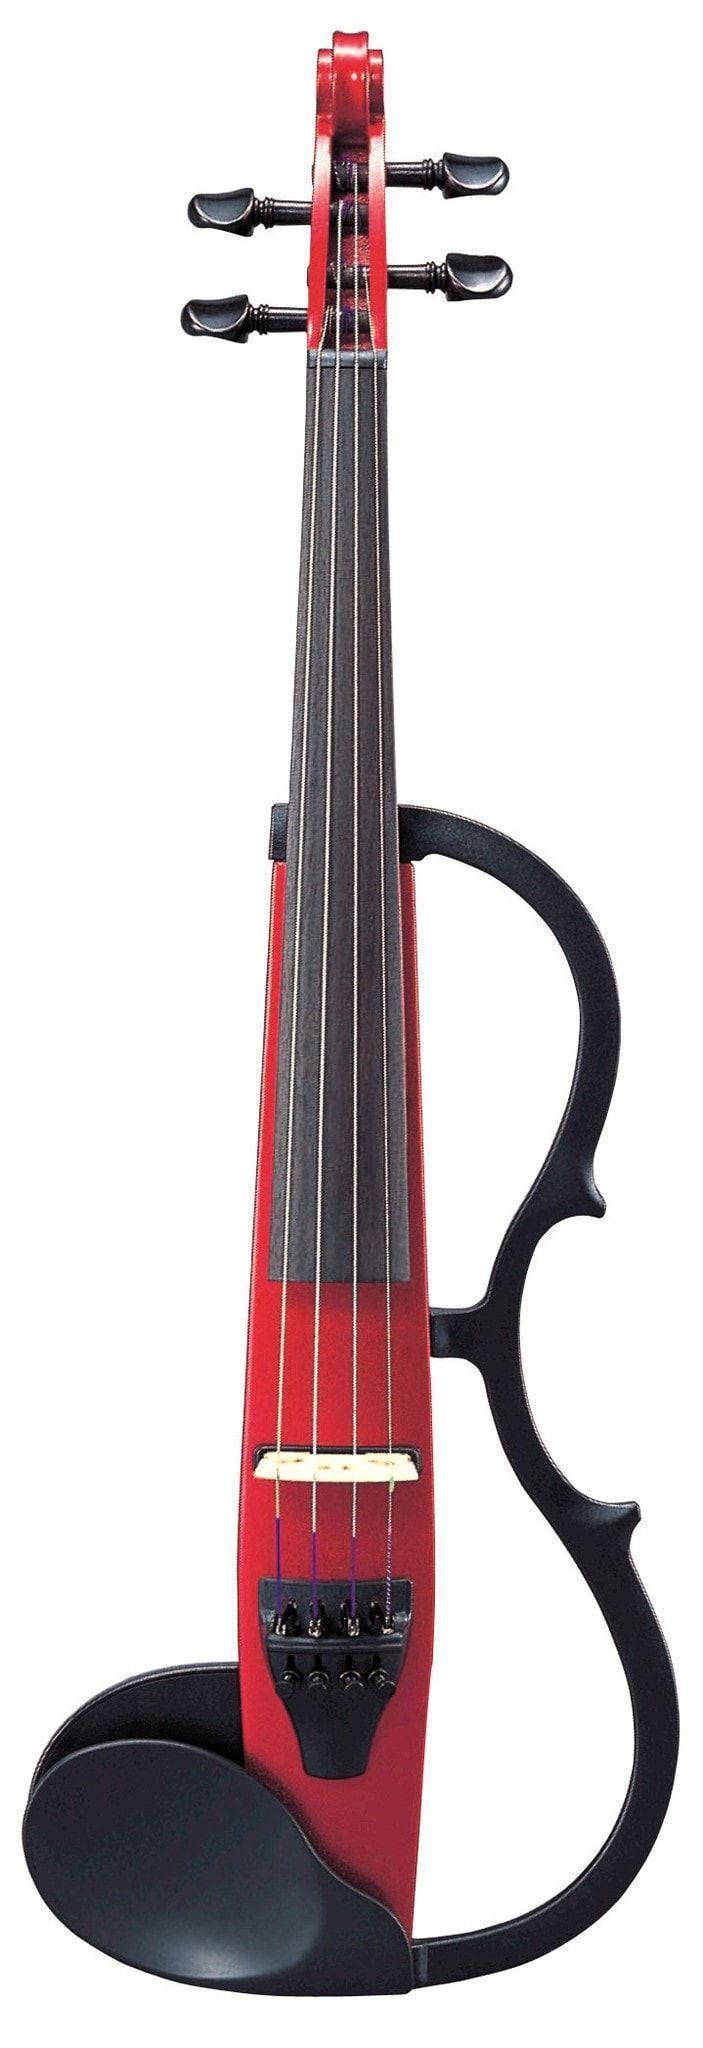 Yamaha SV-130 Silent Electric Violin